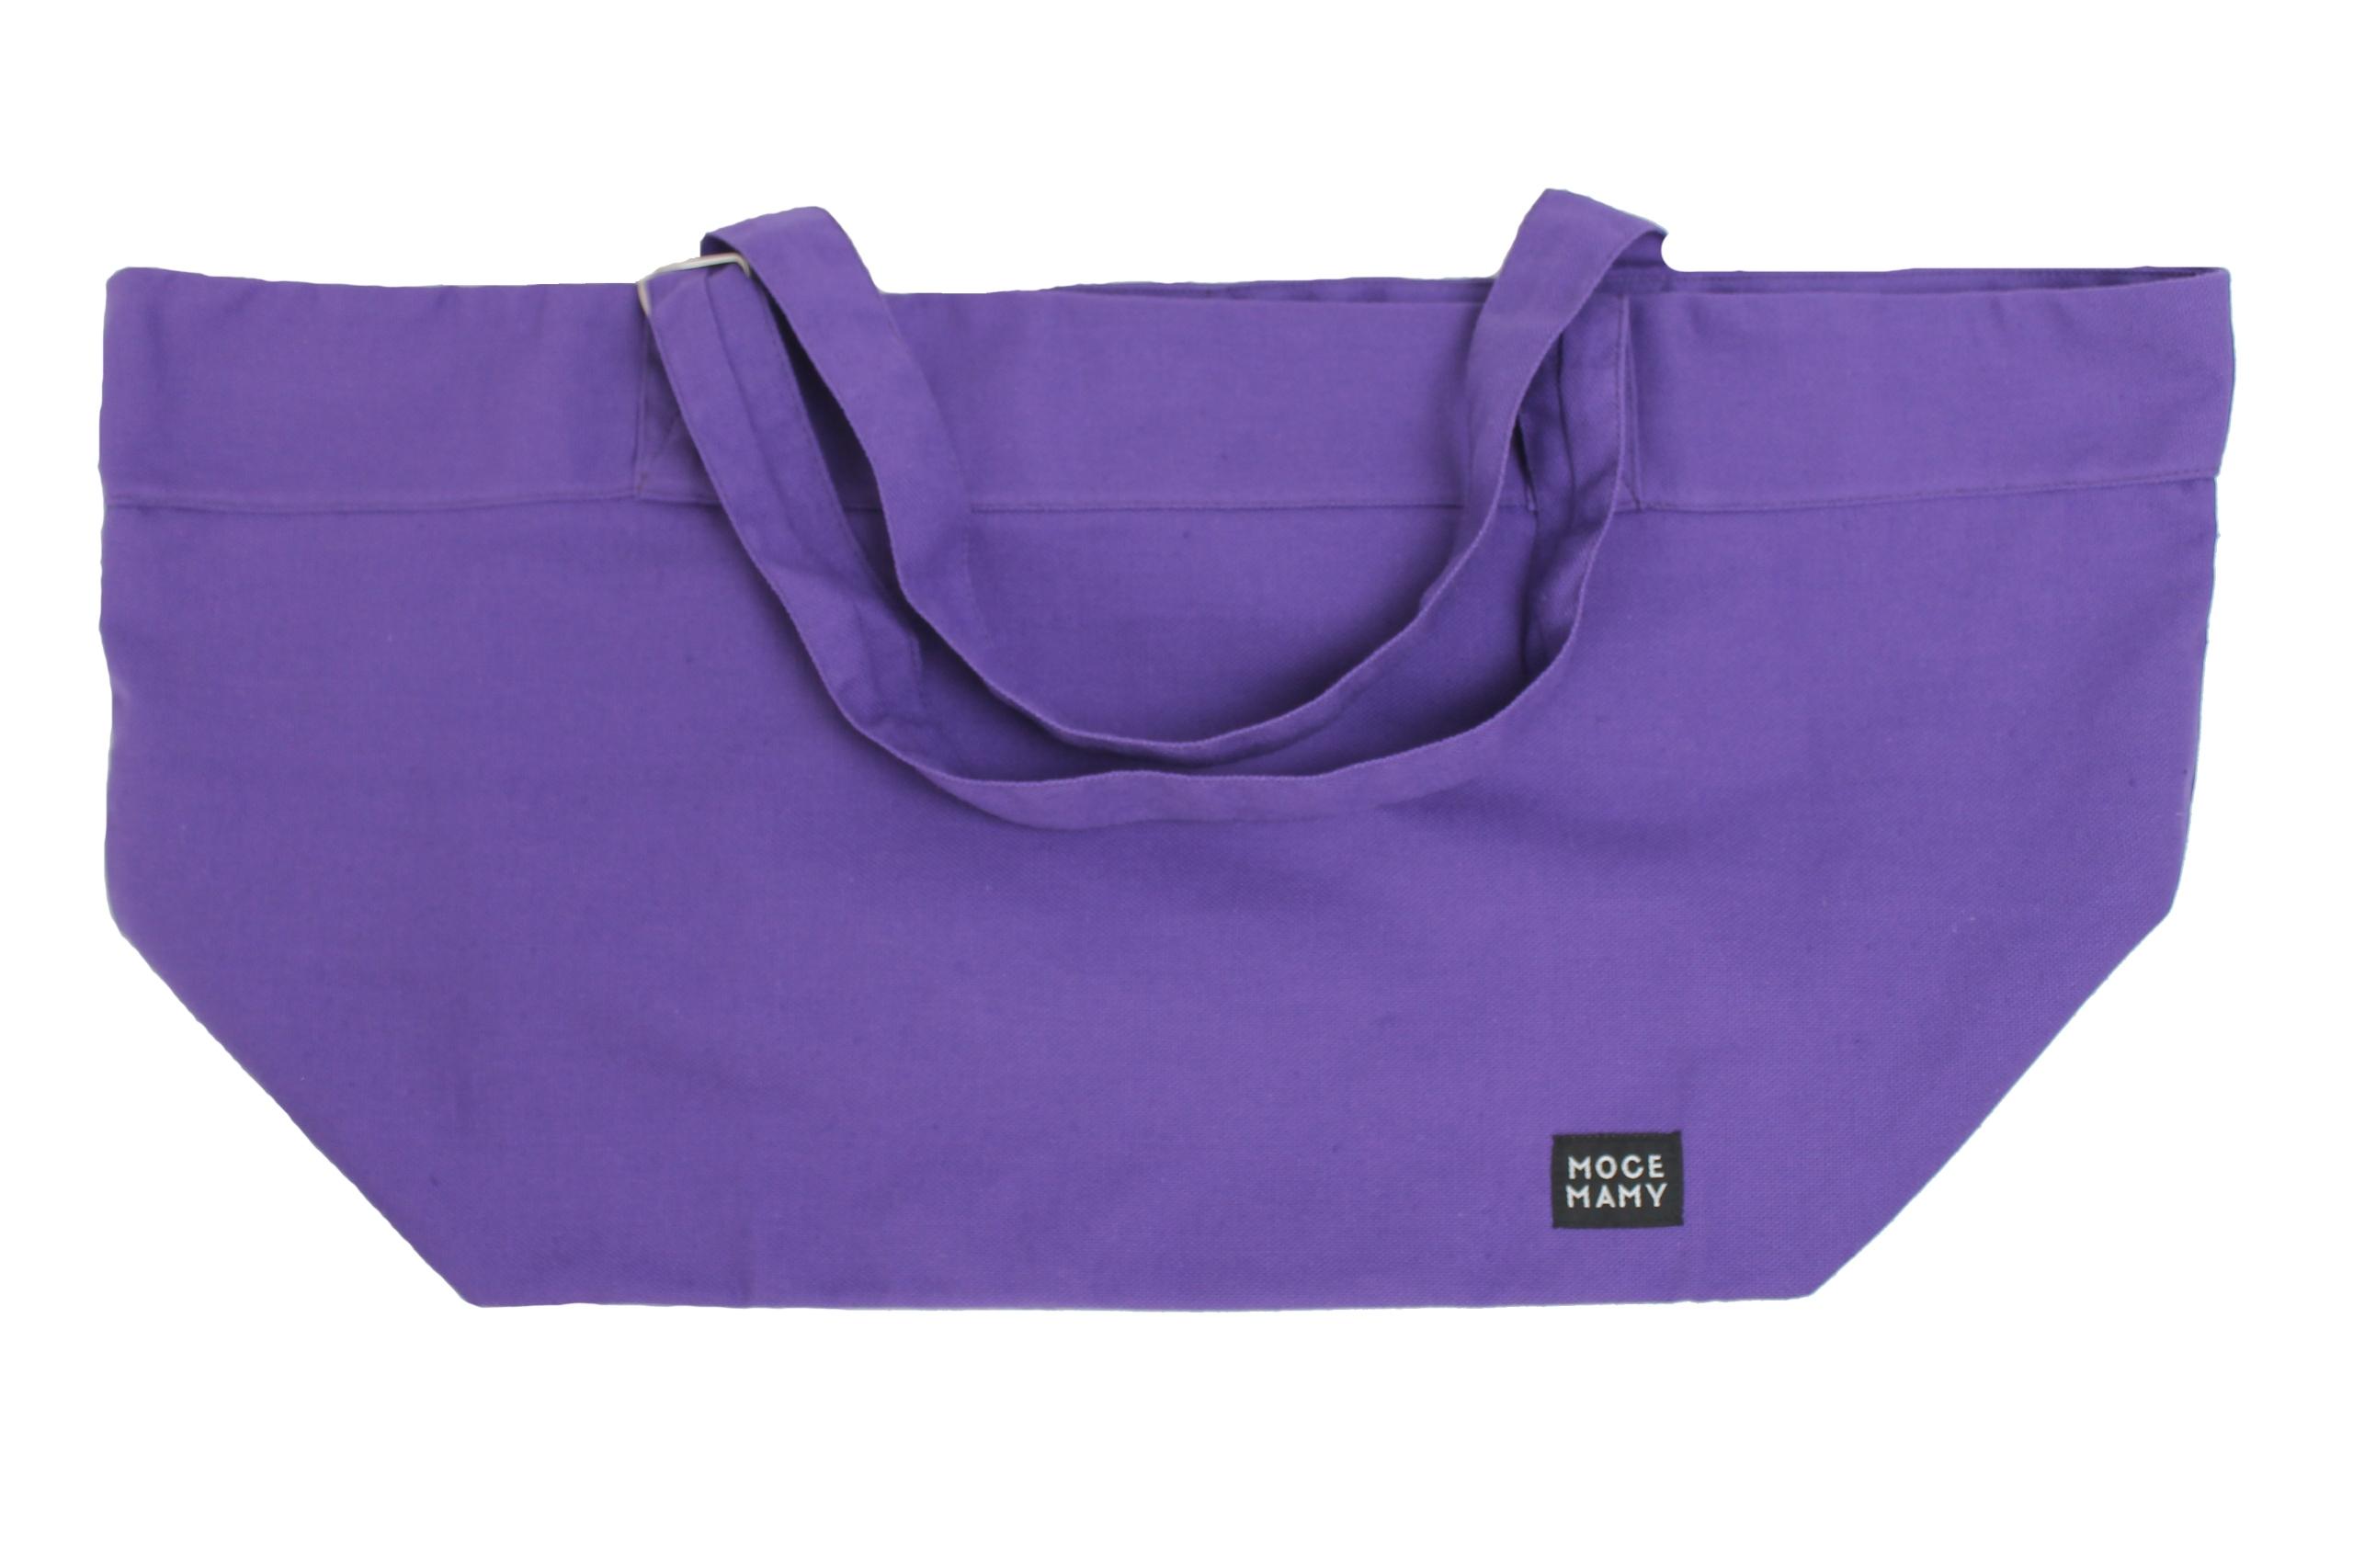 e8d2c8d7e3ad4 Uniwersalna duża bawełniana torba Moce Mamy fiolet - 7573661299 ...